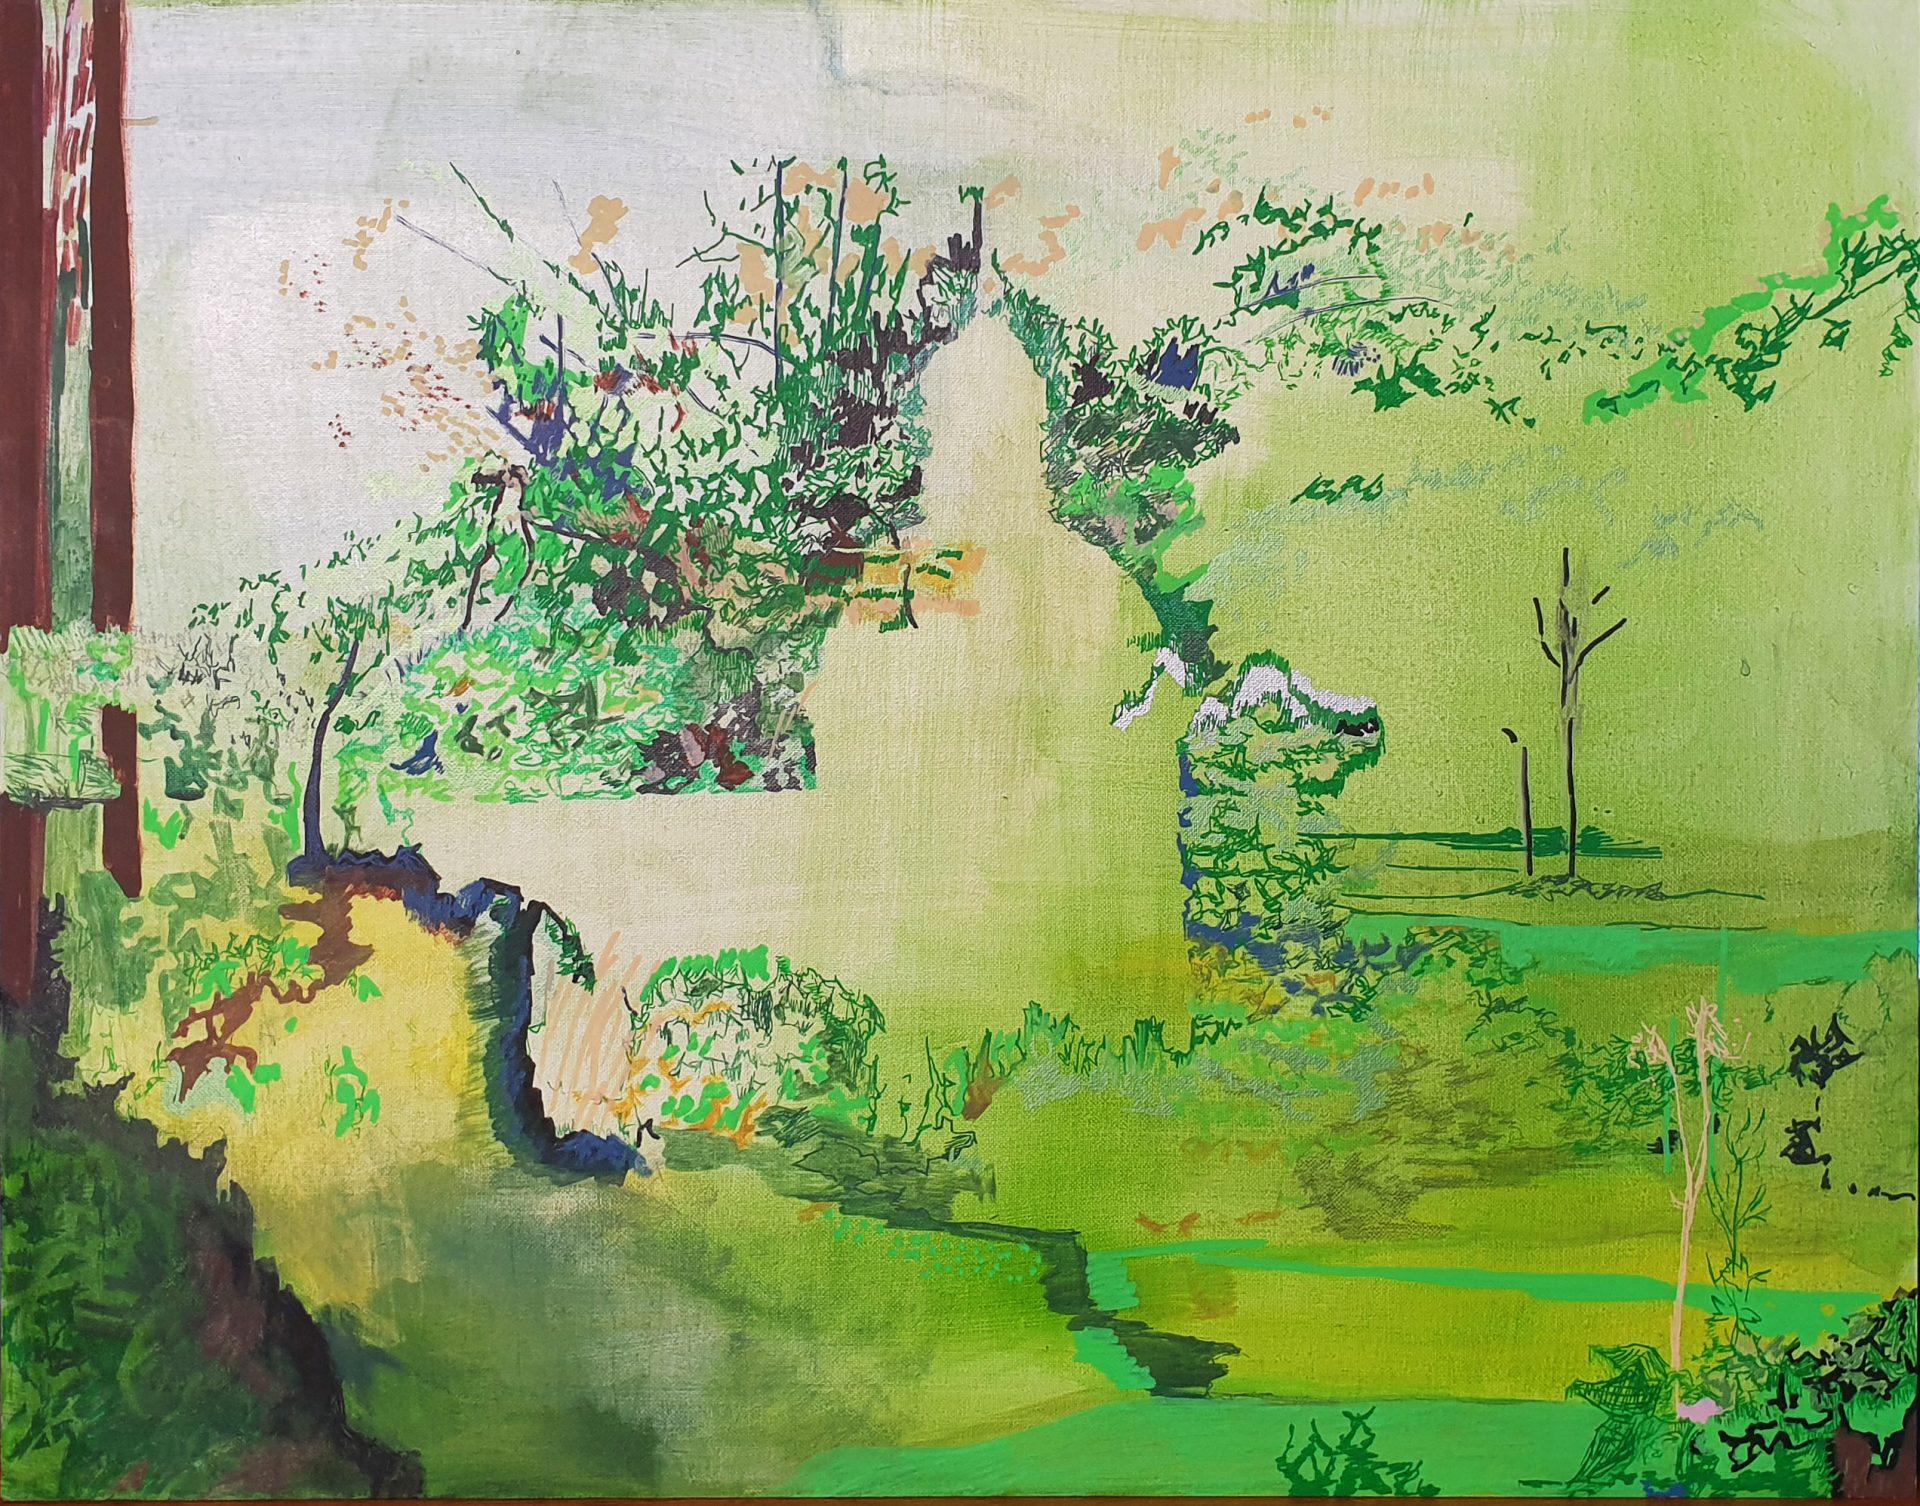 hili greenfeld tales of the east